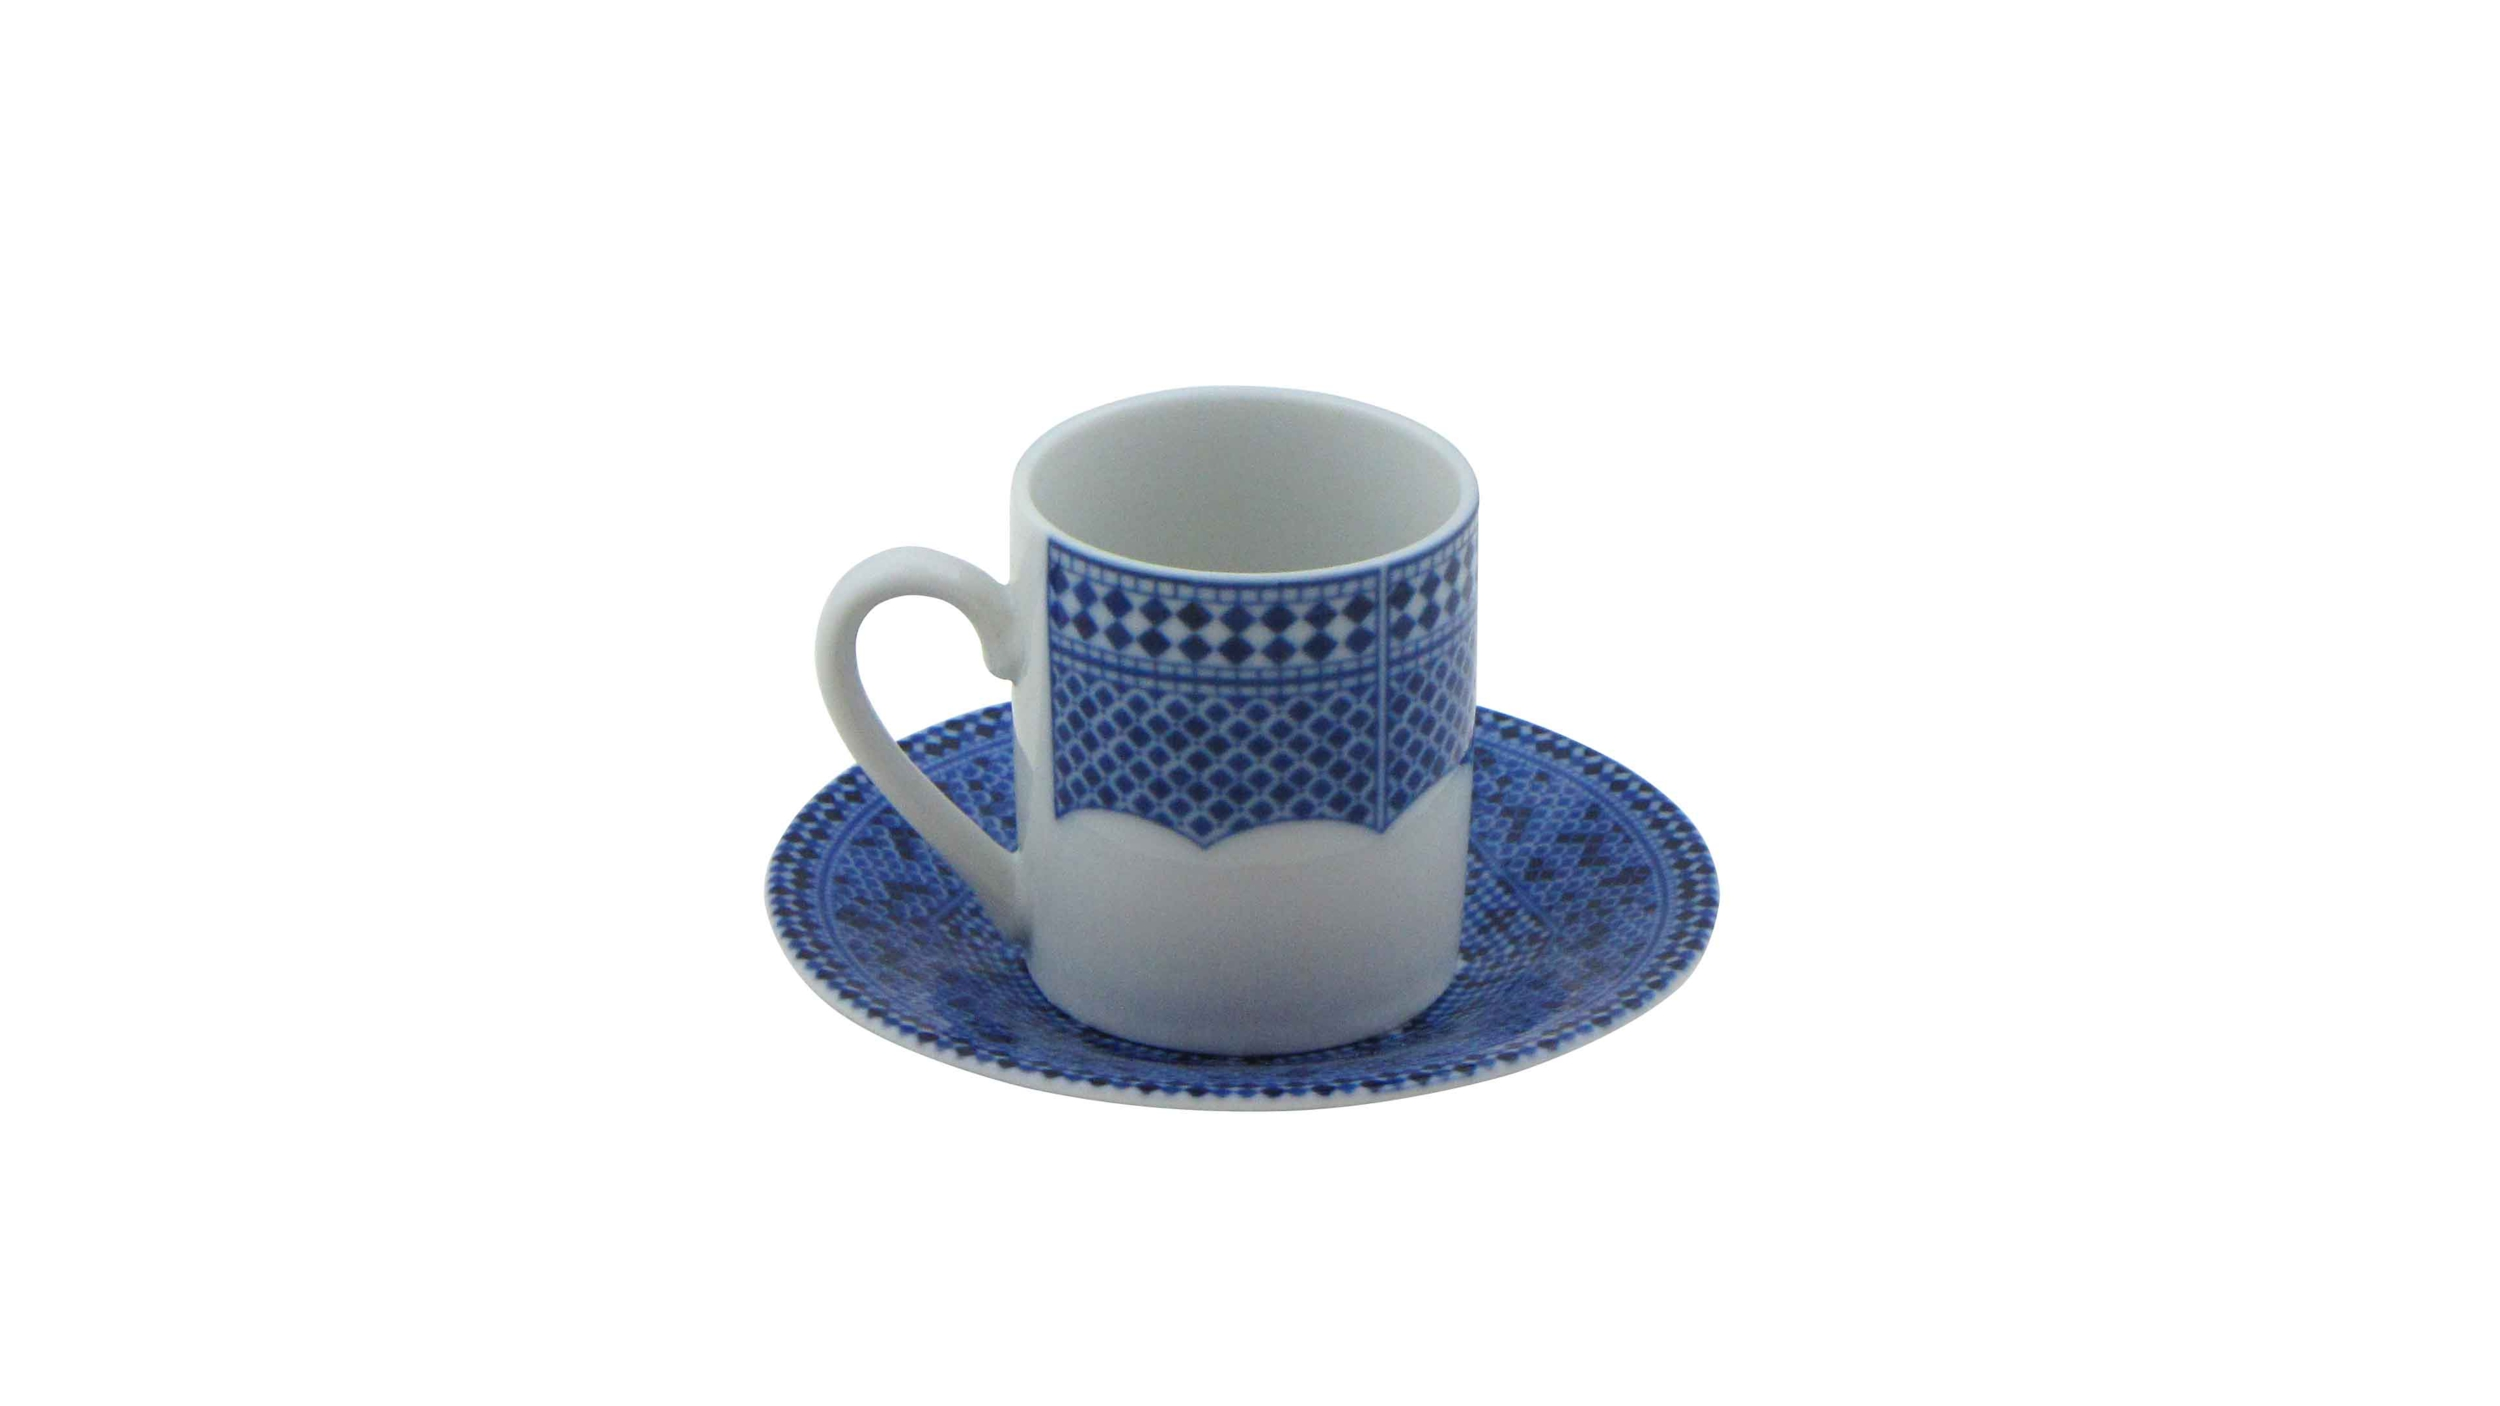 Tasse et sous-tasse Petites, BDF